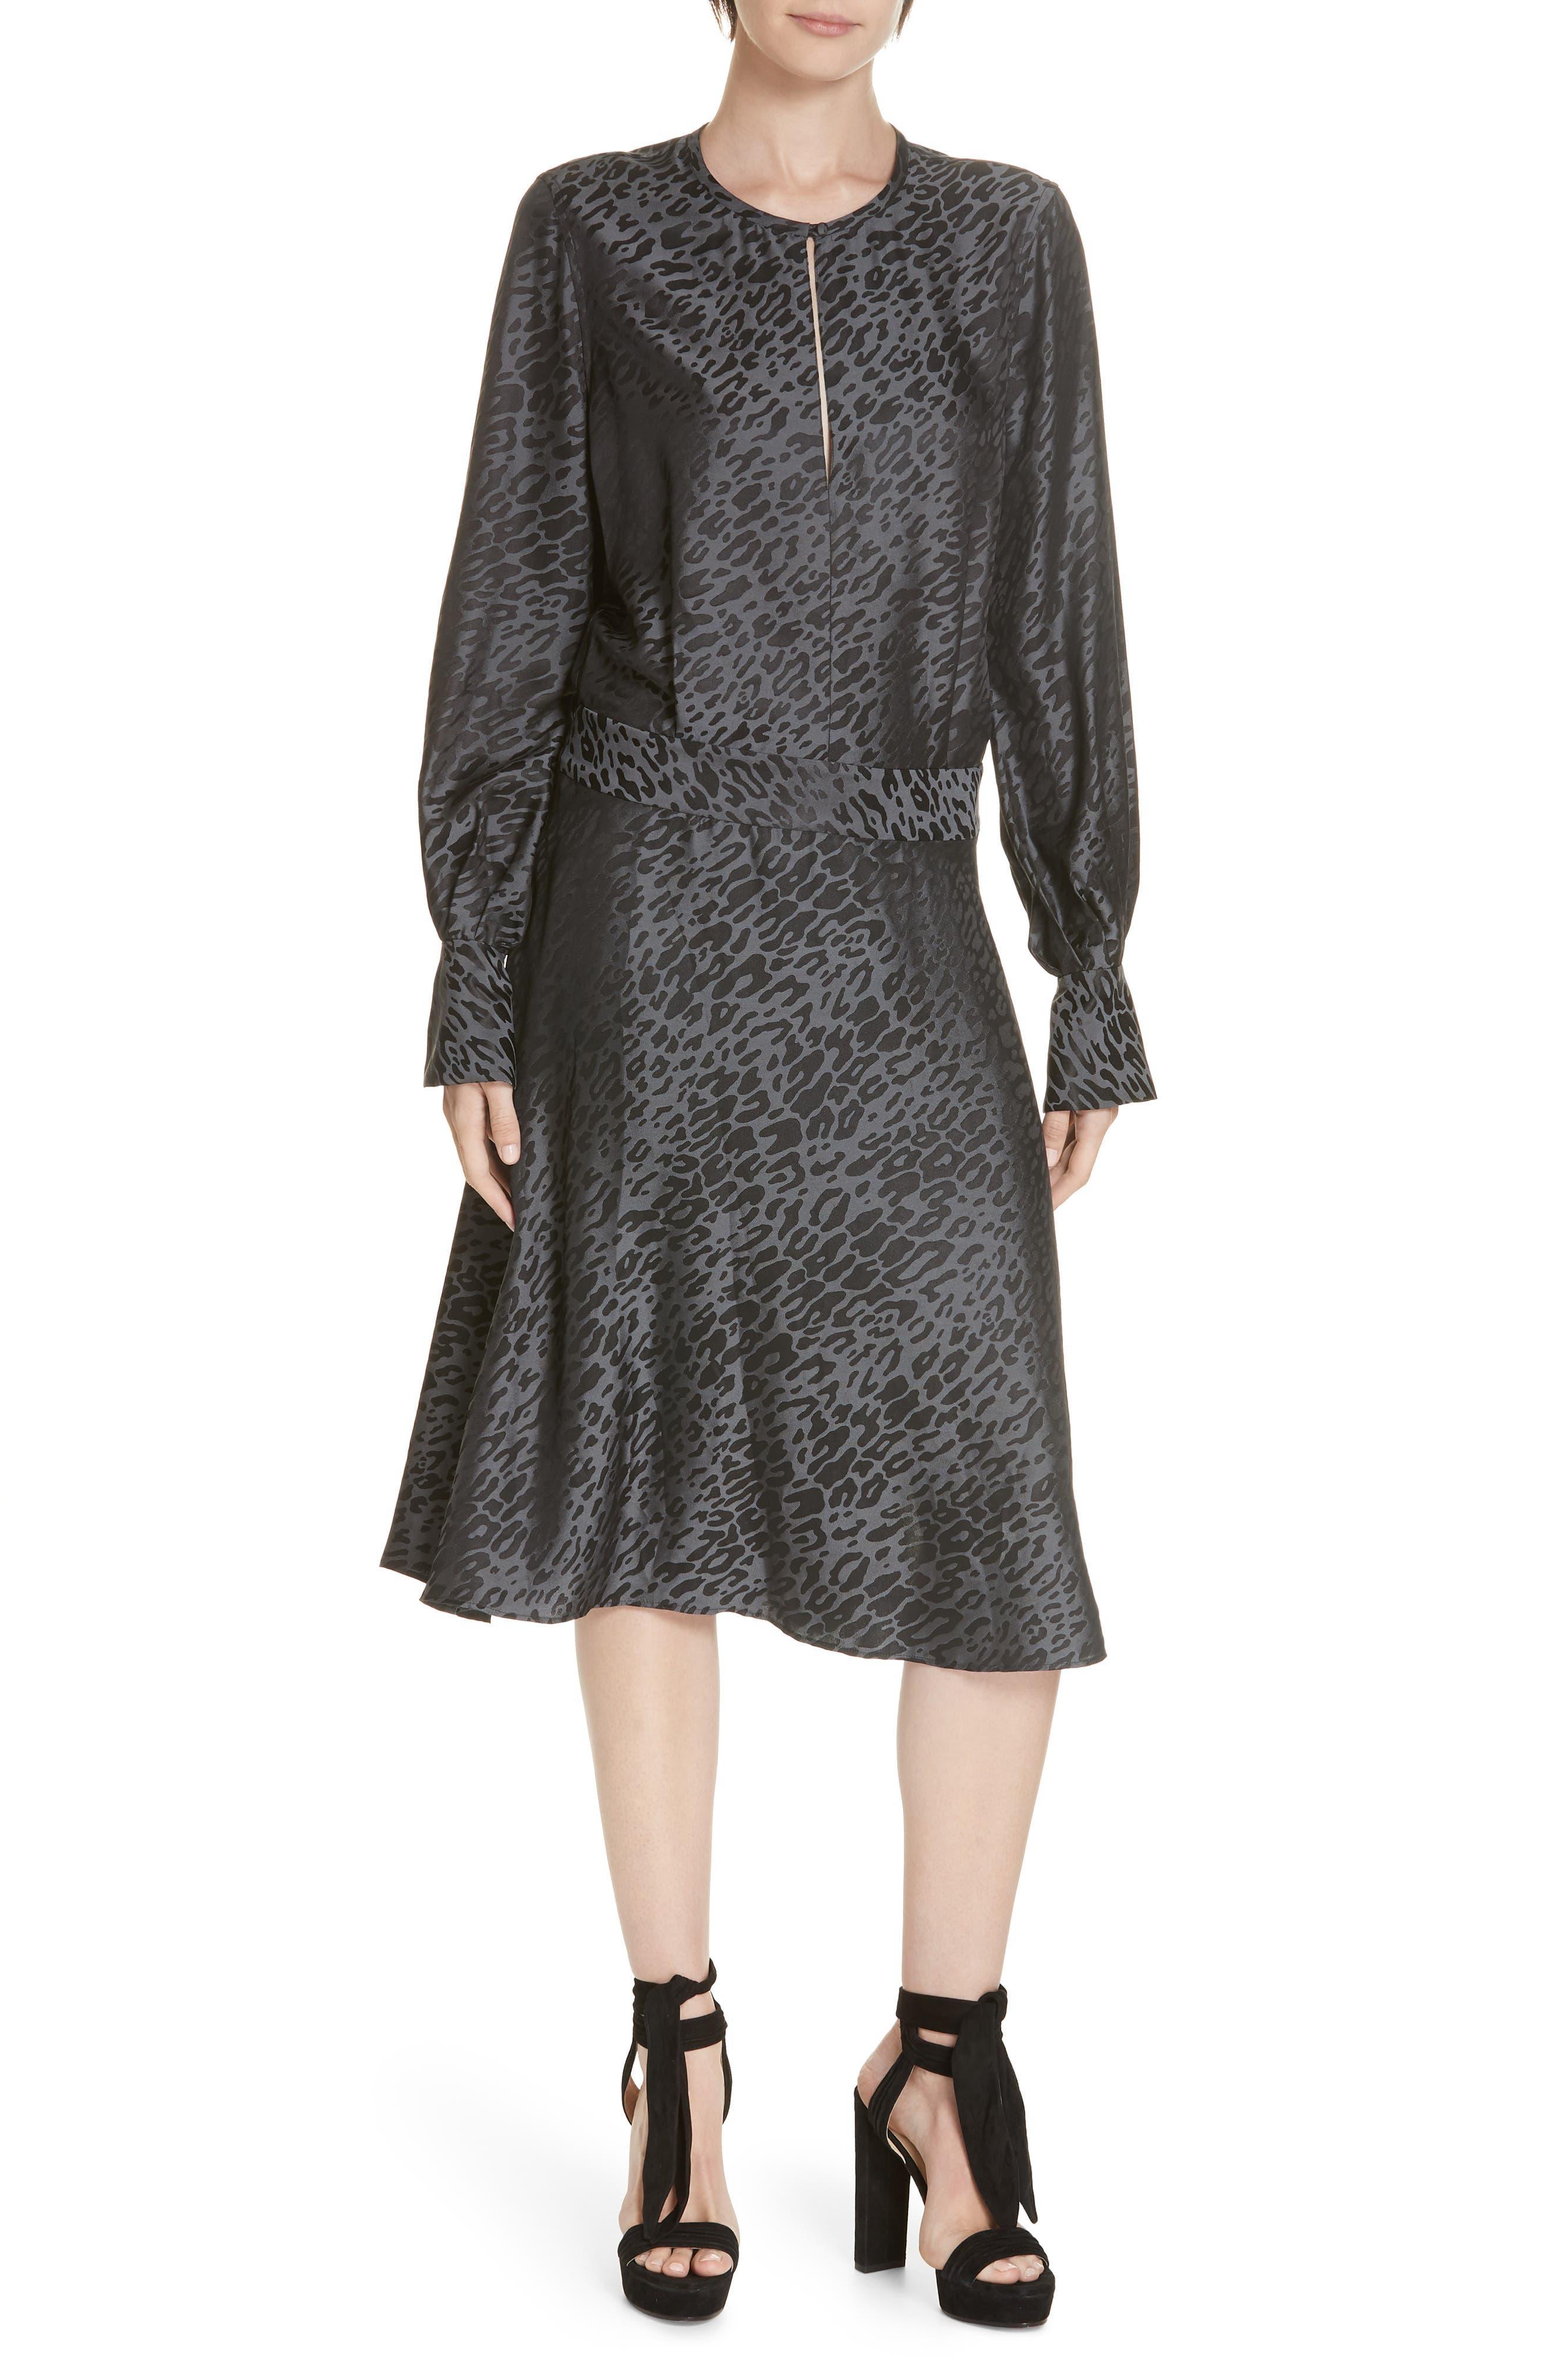 Equipment Magnolia Silk Blend Backless Dress, Black